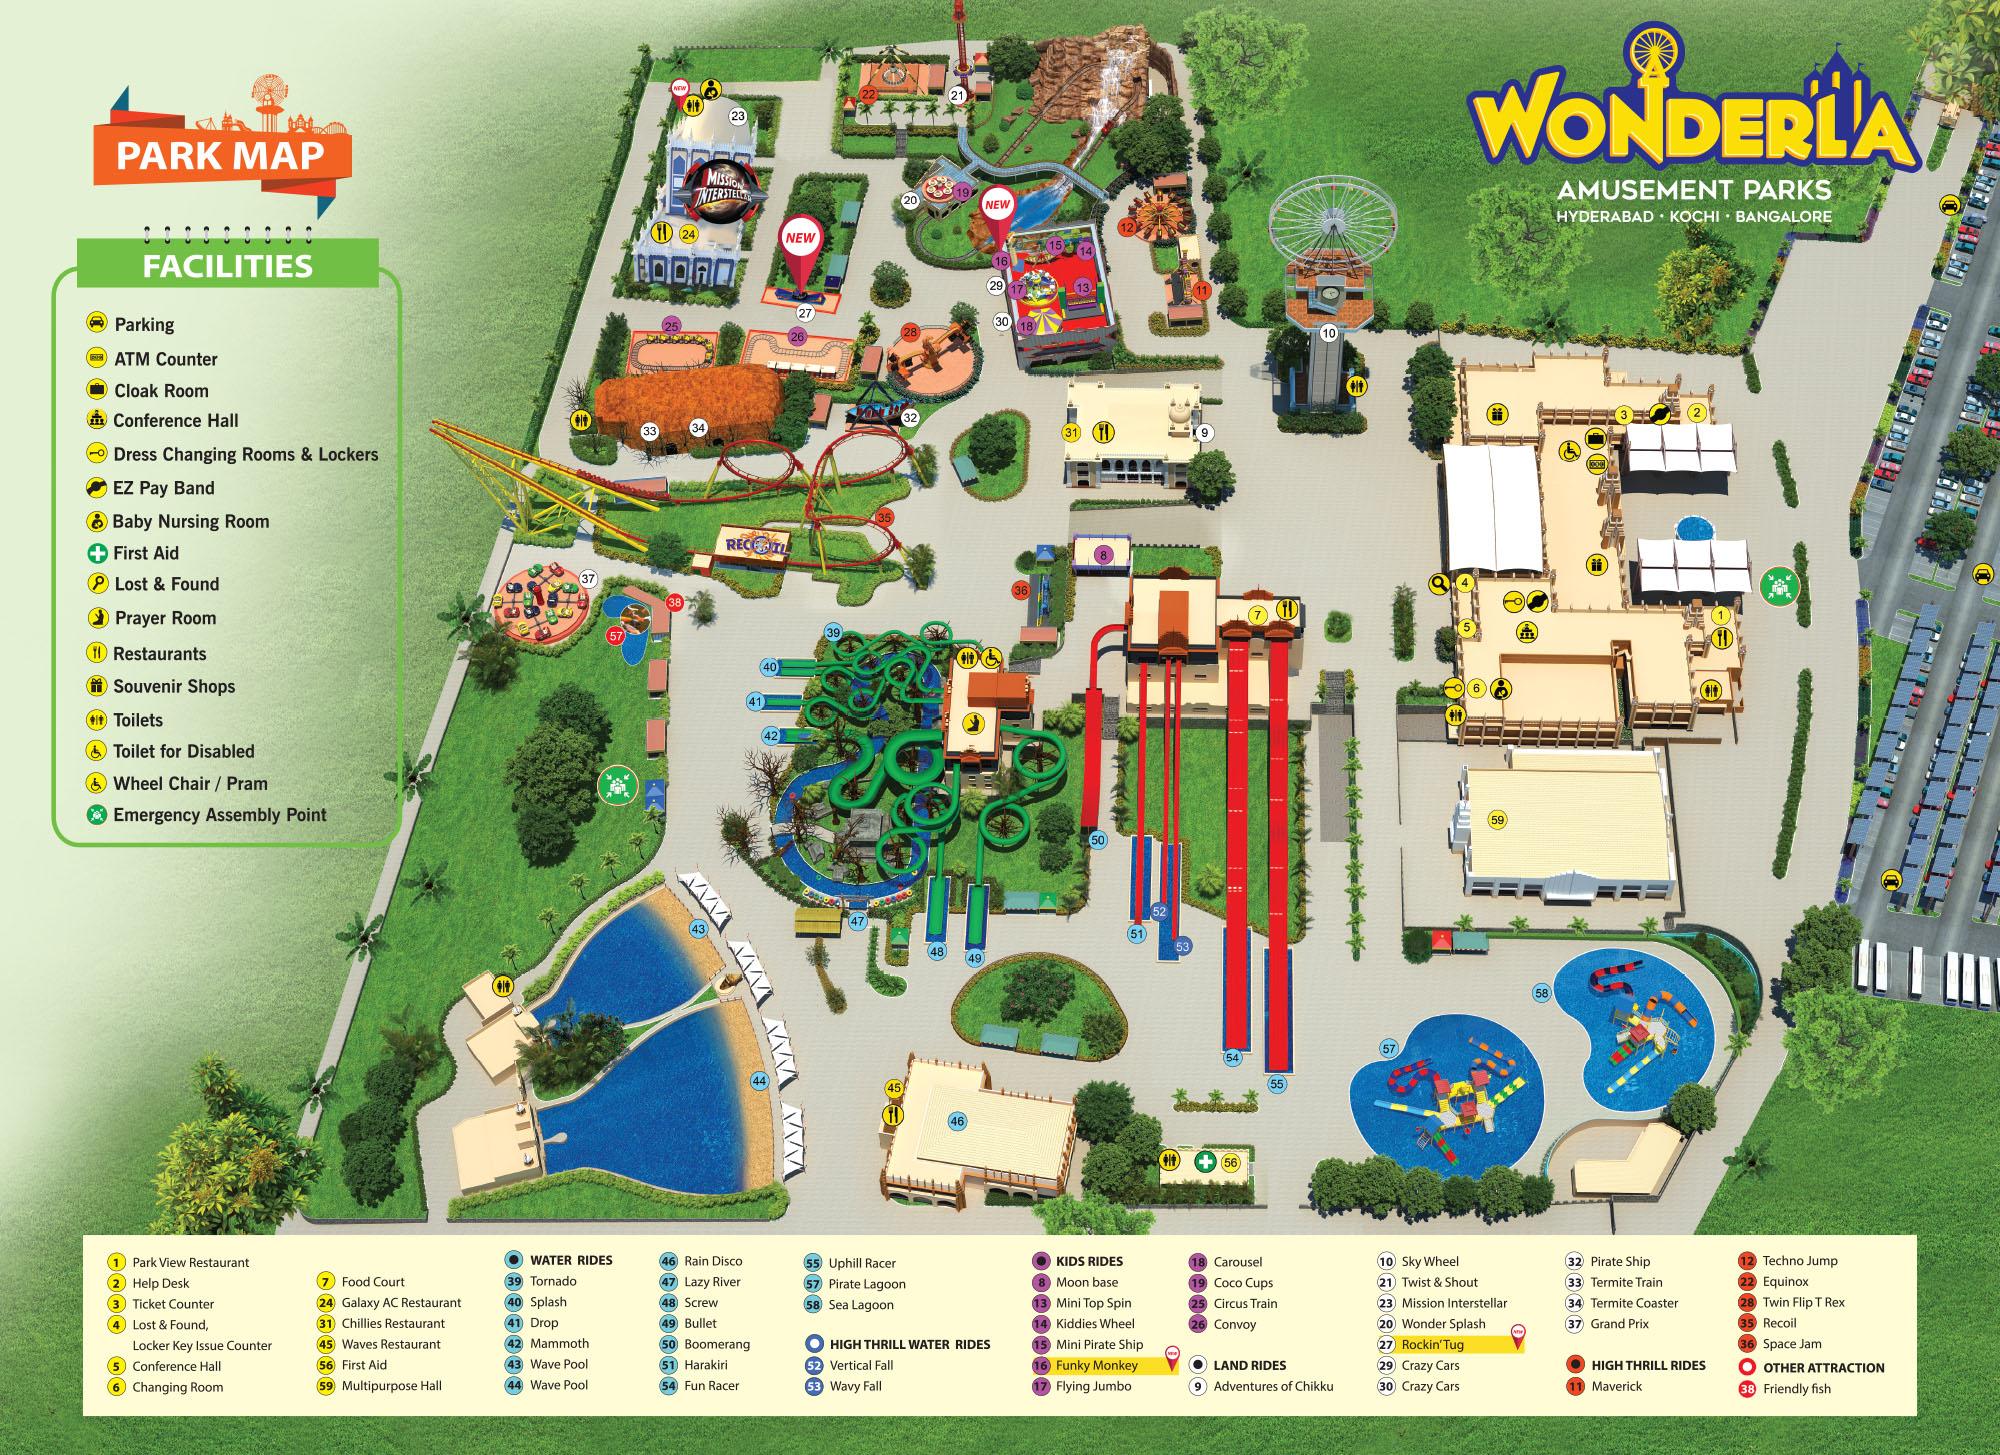 Wonderla Hyderabad Park Map   Wonderla Hyderabad Park on islamabad map, courtallam map, chhatrapati shivaji international airport map, lahore map, saddar map, south asia map, peshawar map, india map, trivandrum map, duqm map, karachi map, chennai map, assam map, colombo map, anantapur district map, ahmedabad gujarat map, myanmar map, dhaka map, magarpatta map, andhra pradesh map,